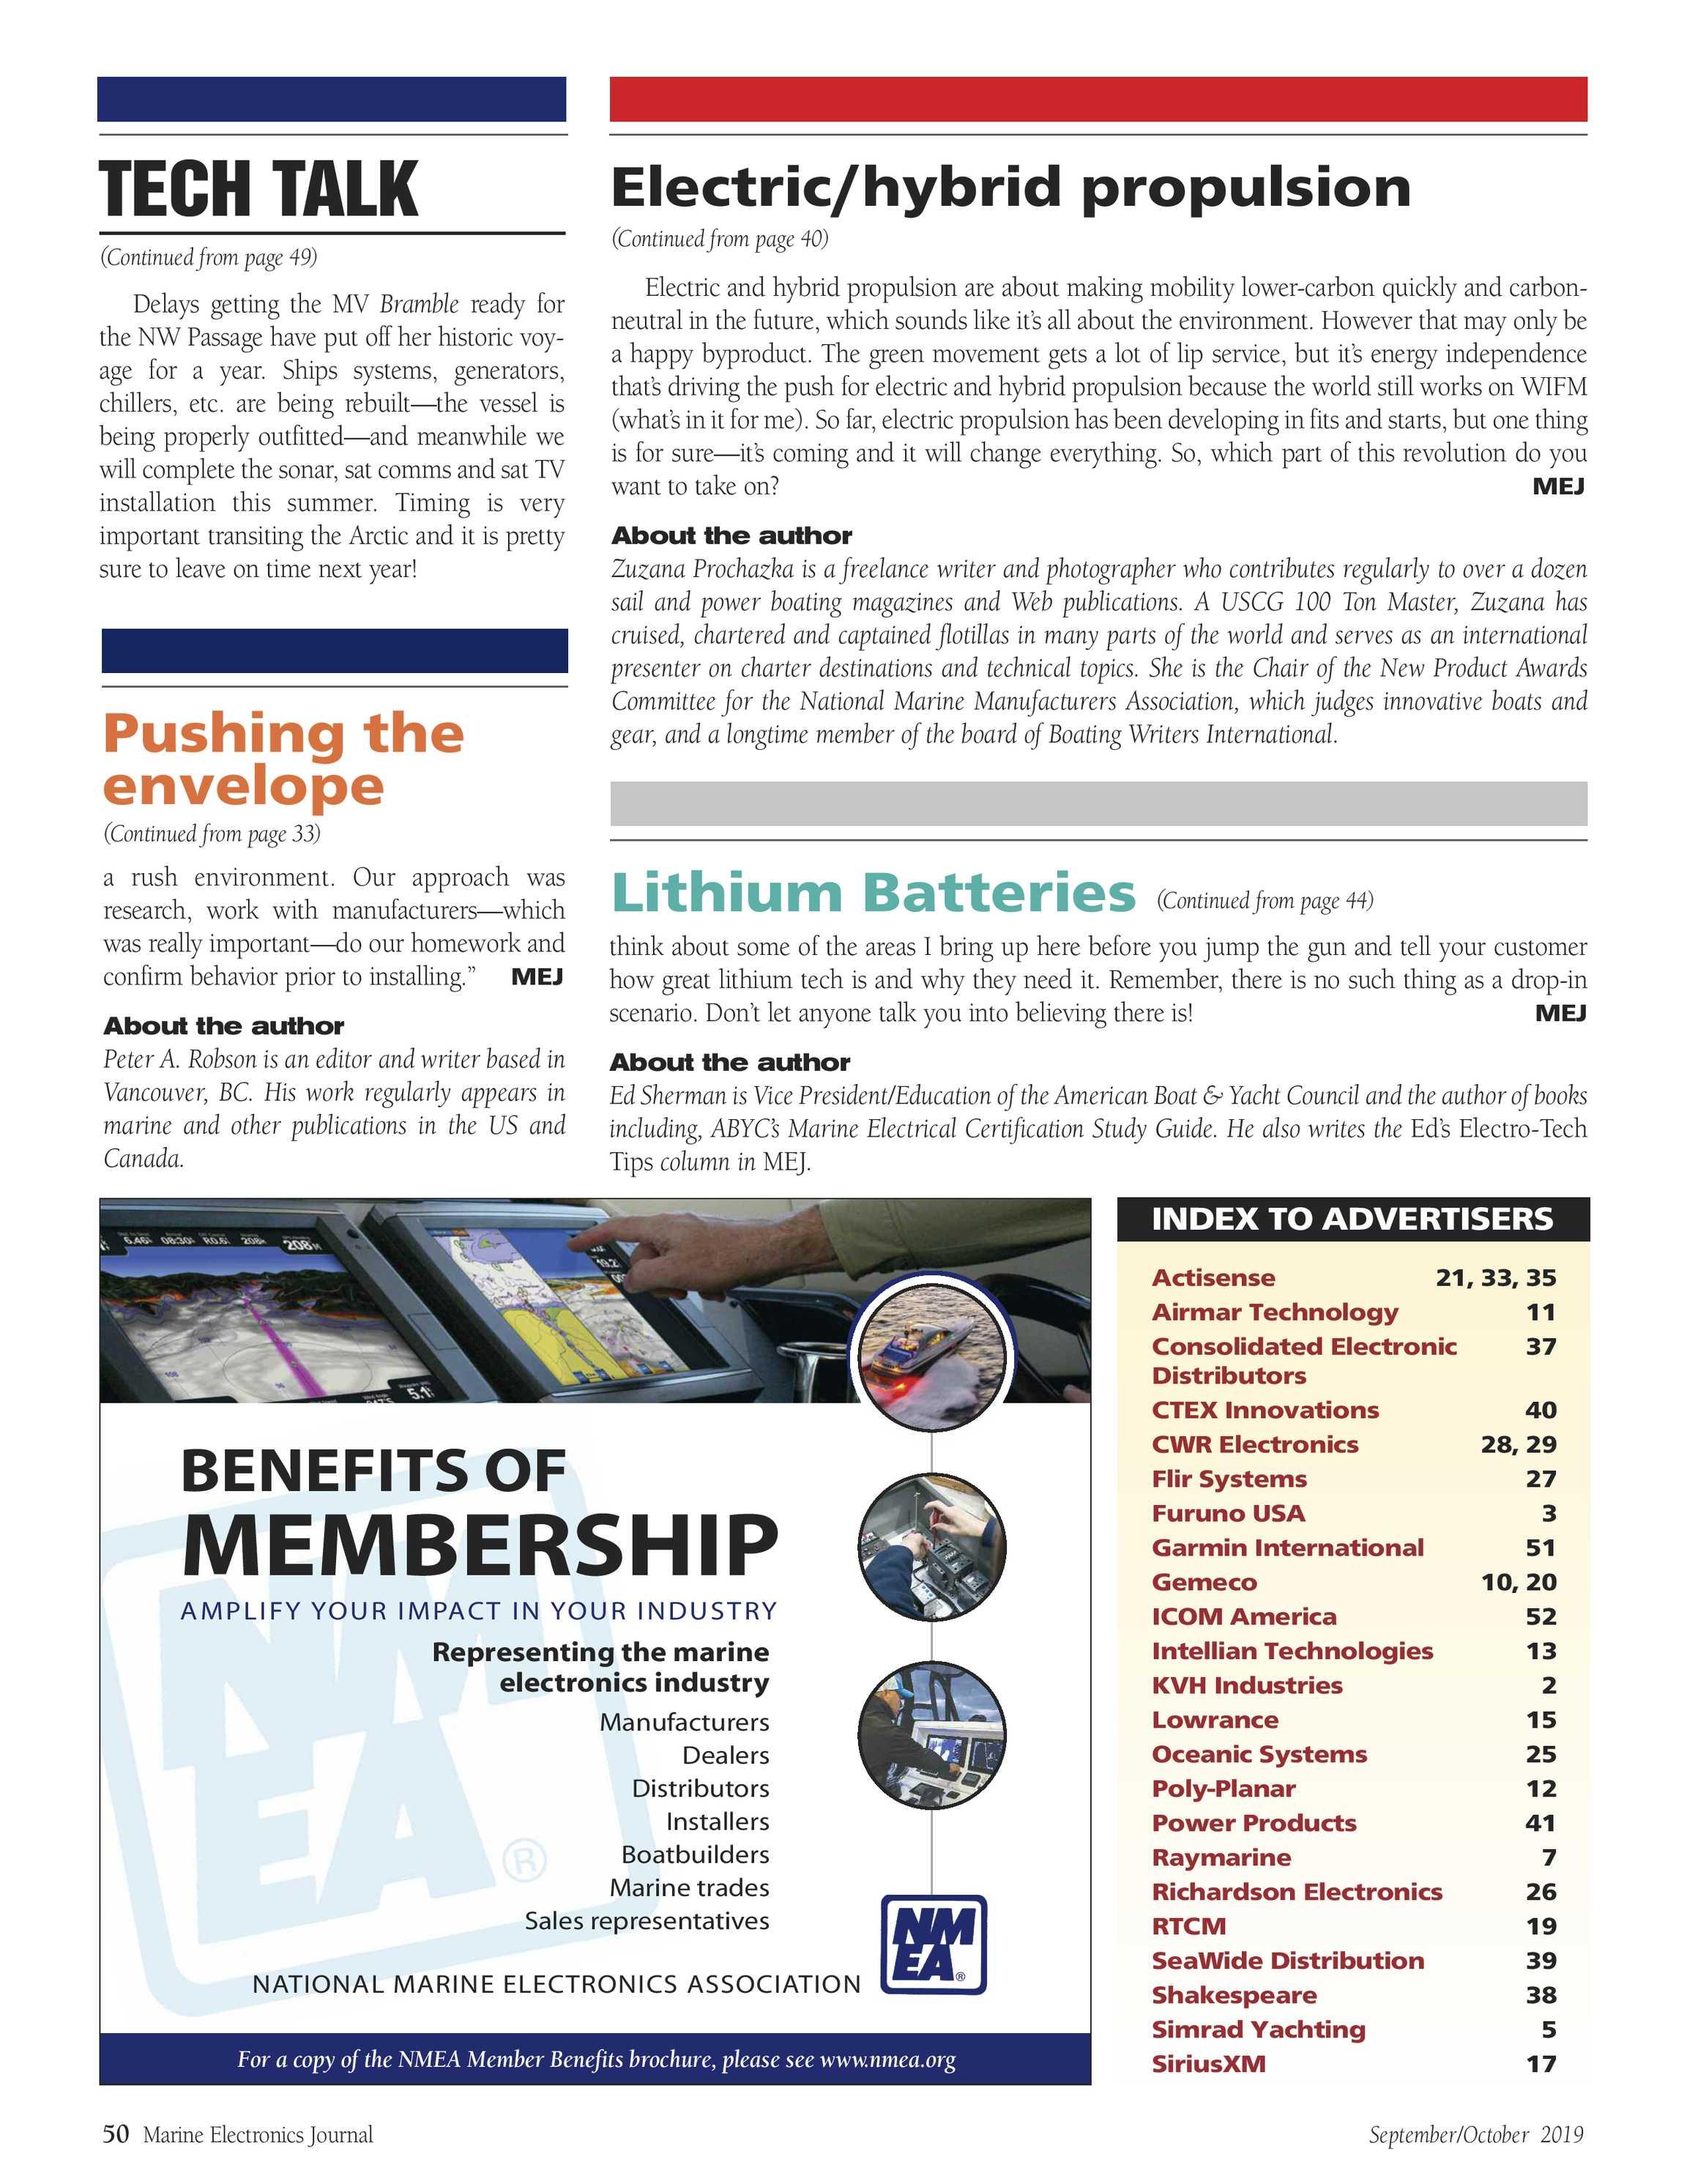 ME Marine Electronics - September/October 2019 - page 50